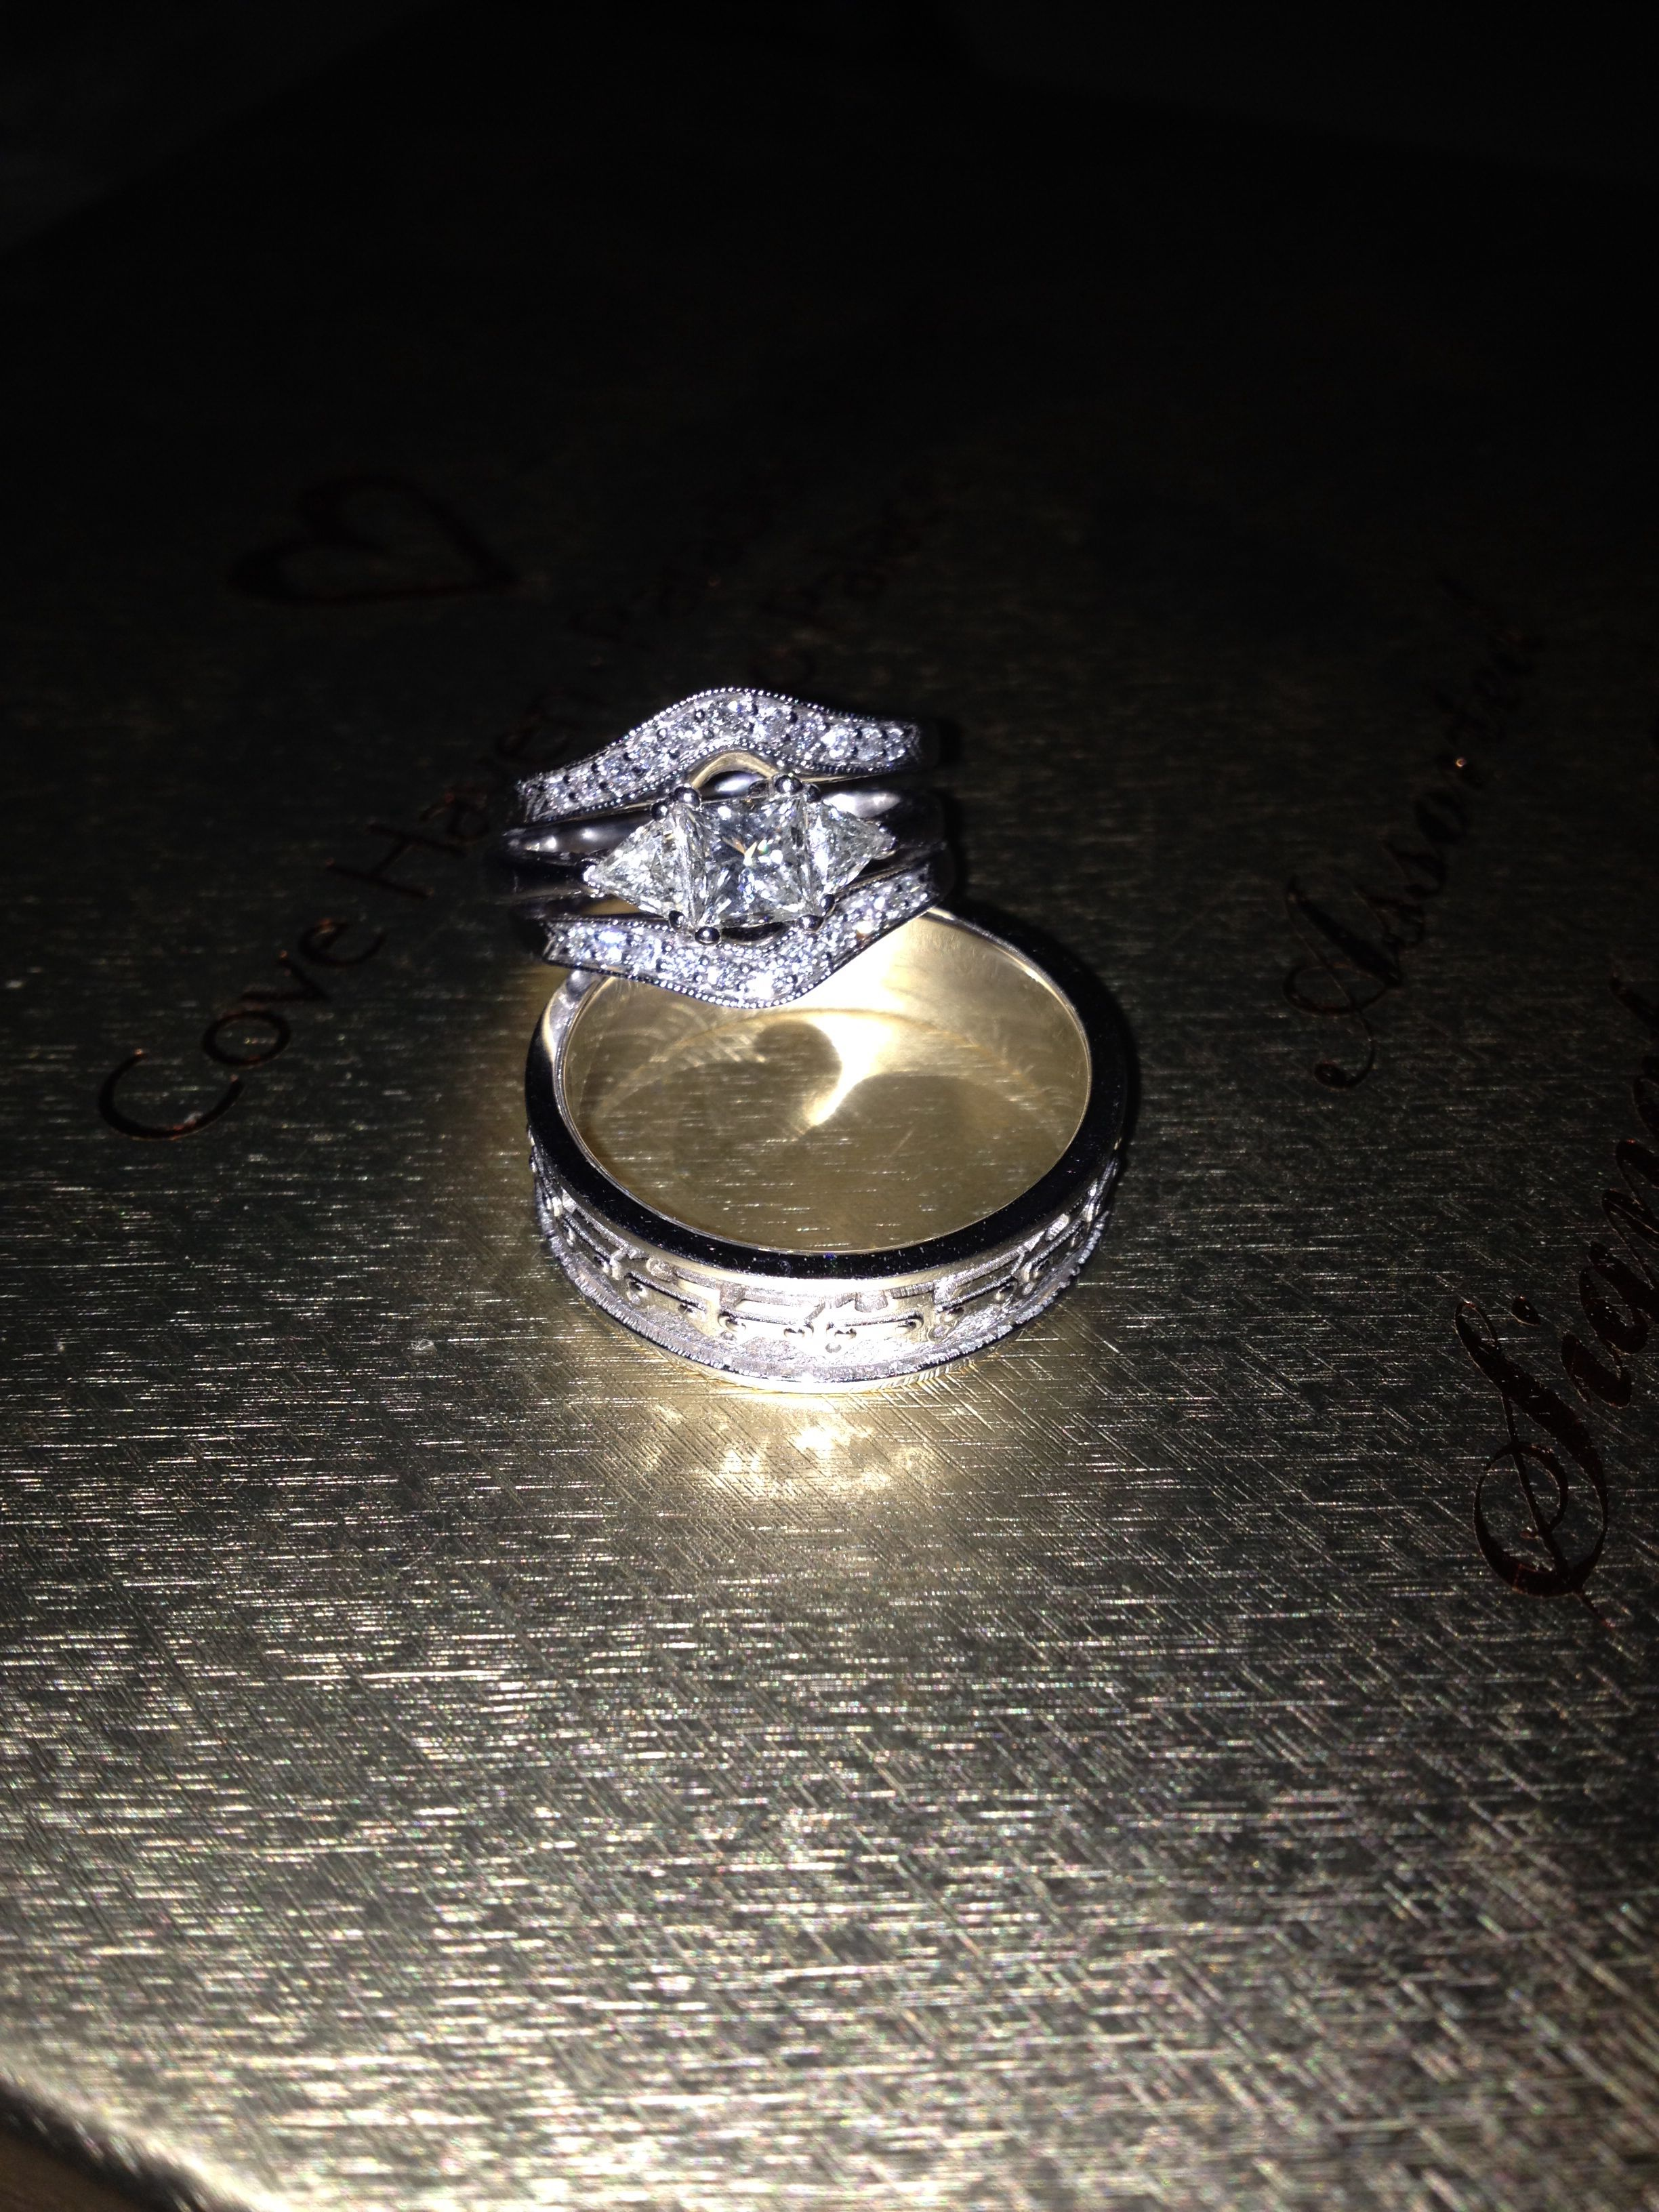 Pin on Wedding 9/21/13!!!